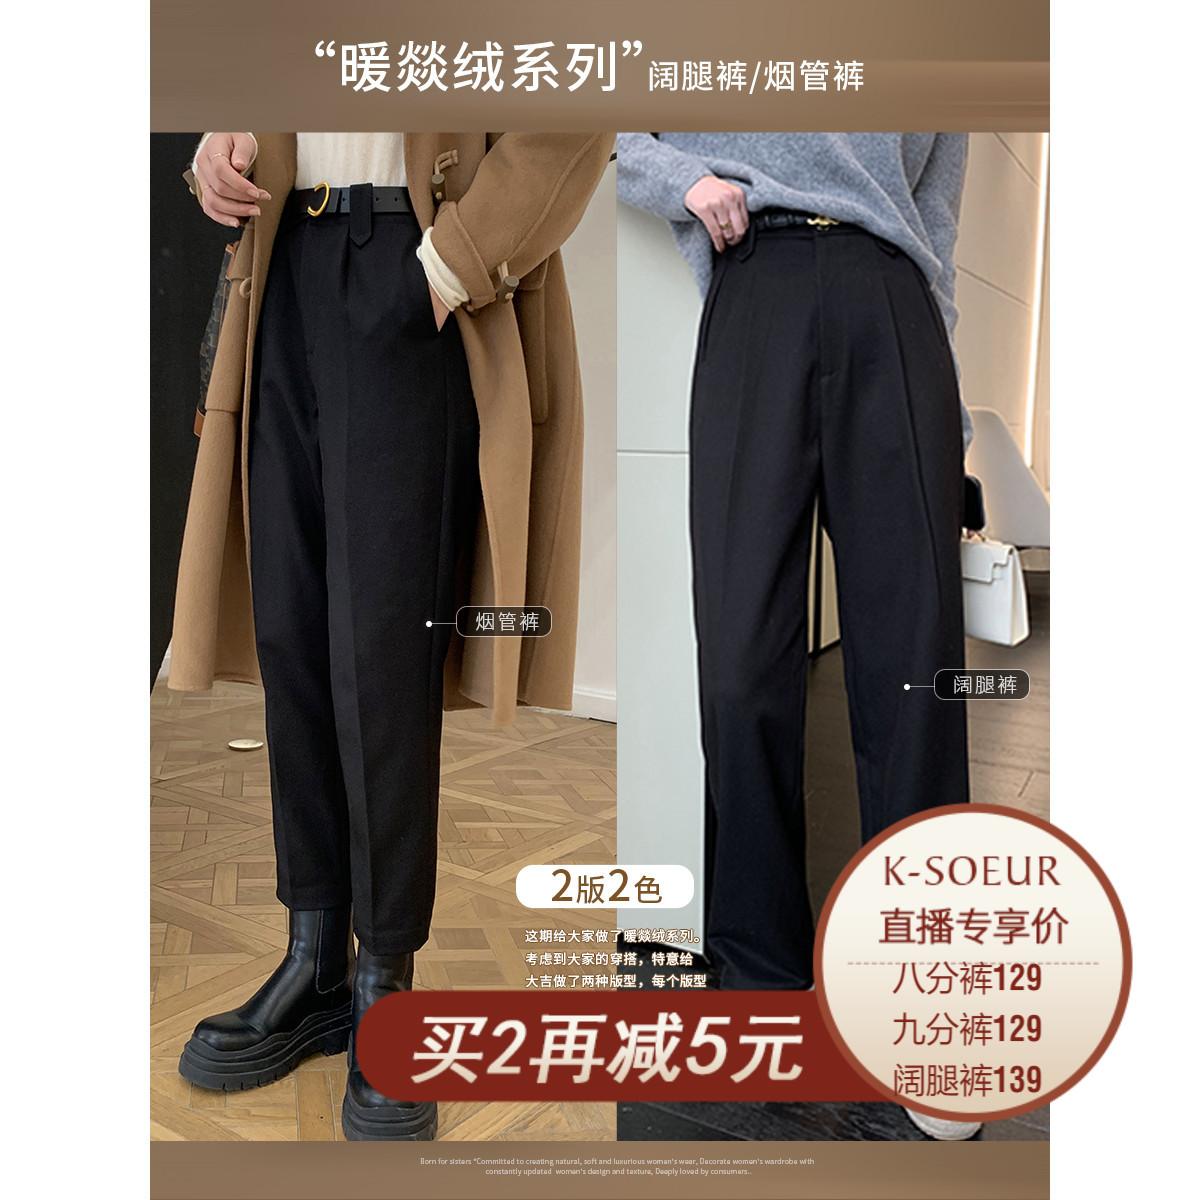 K姐 【暖燚绒系列】3个版型 小个子bi入八分裤+九分裤+阔腿裤